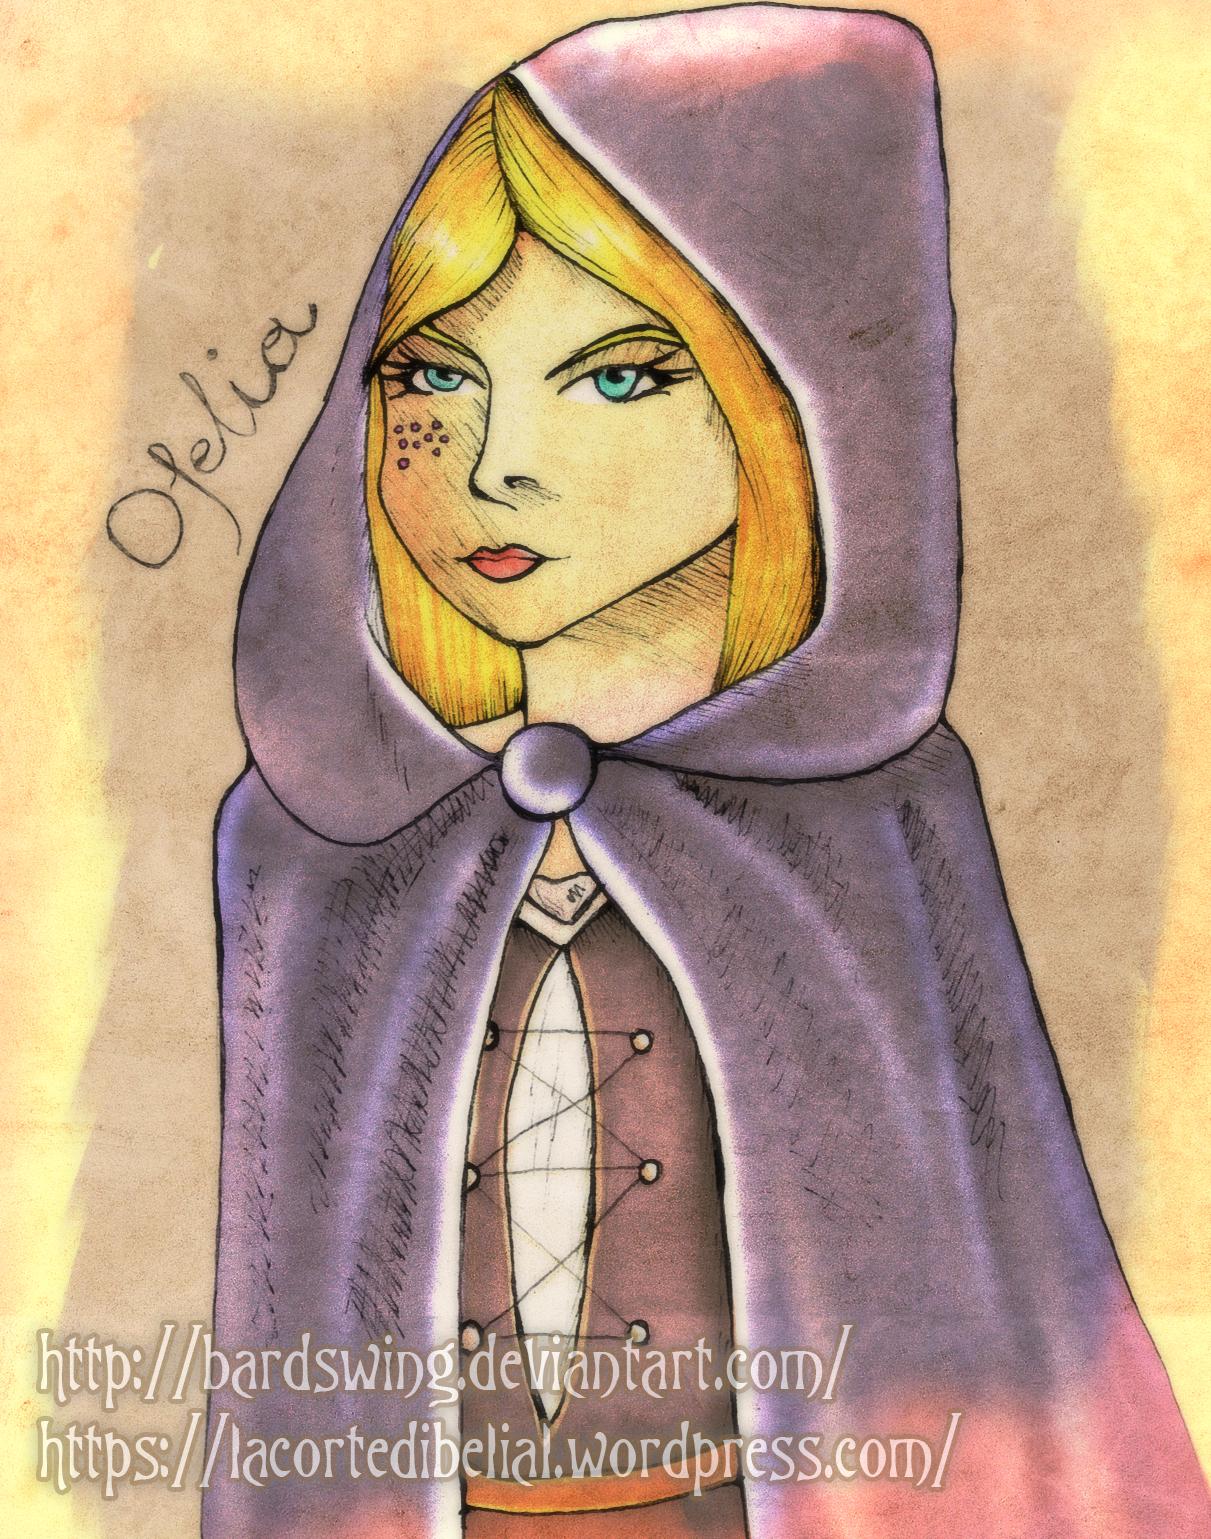 Ofelia Belial Bardswing fantasy